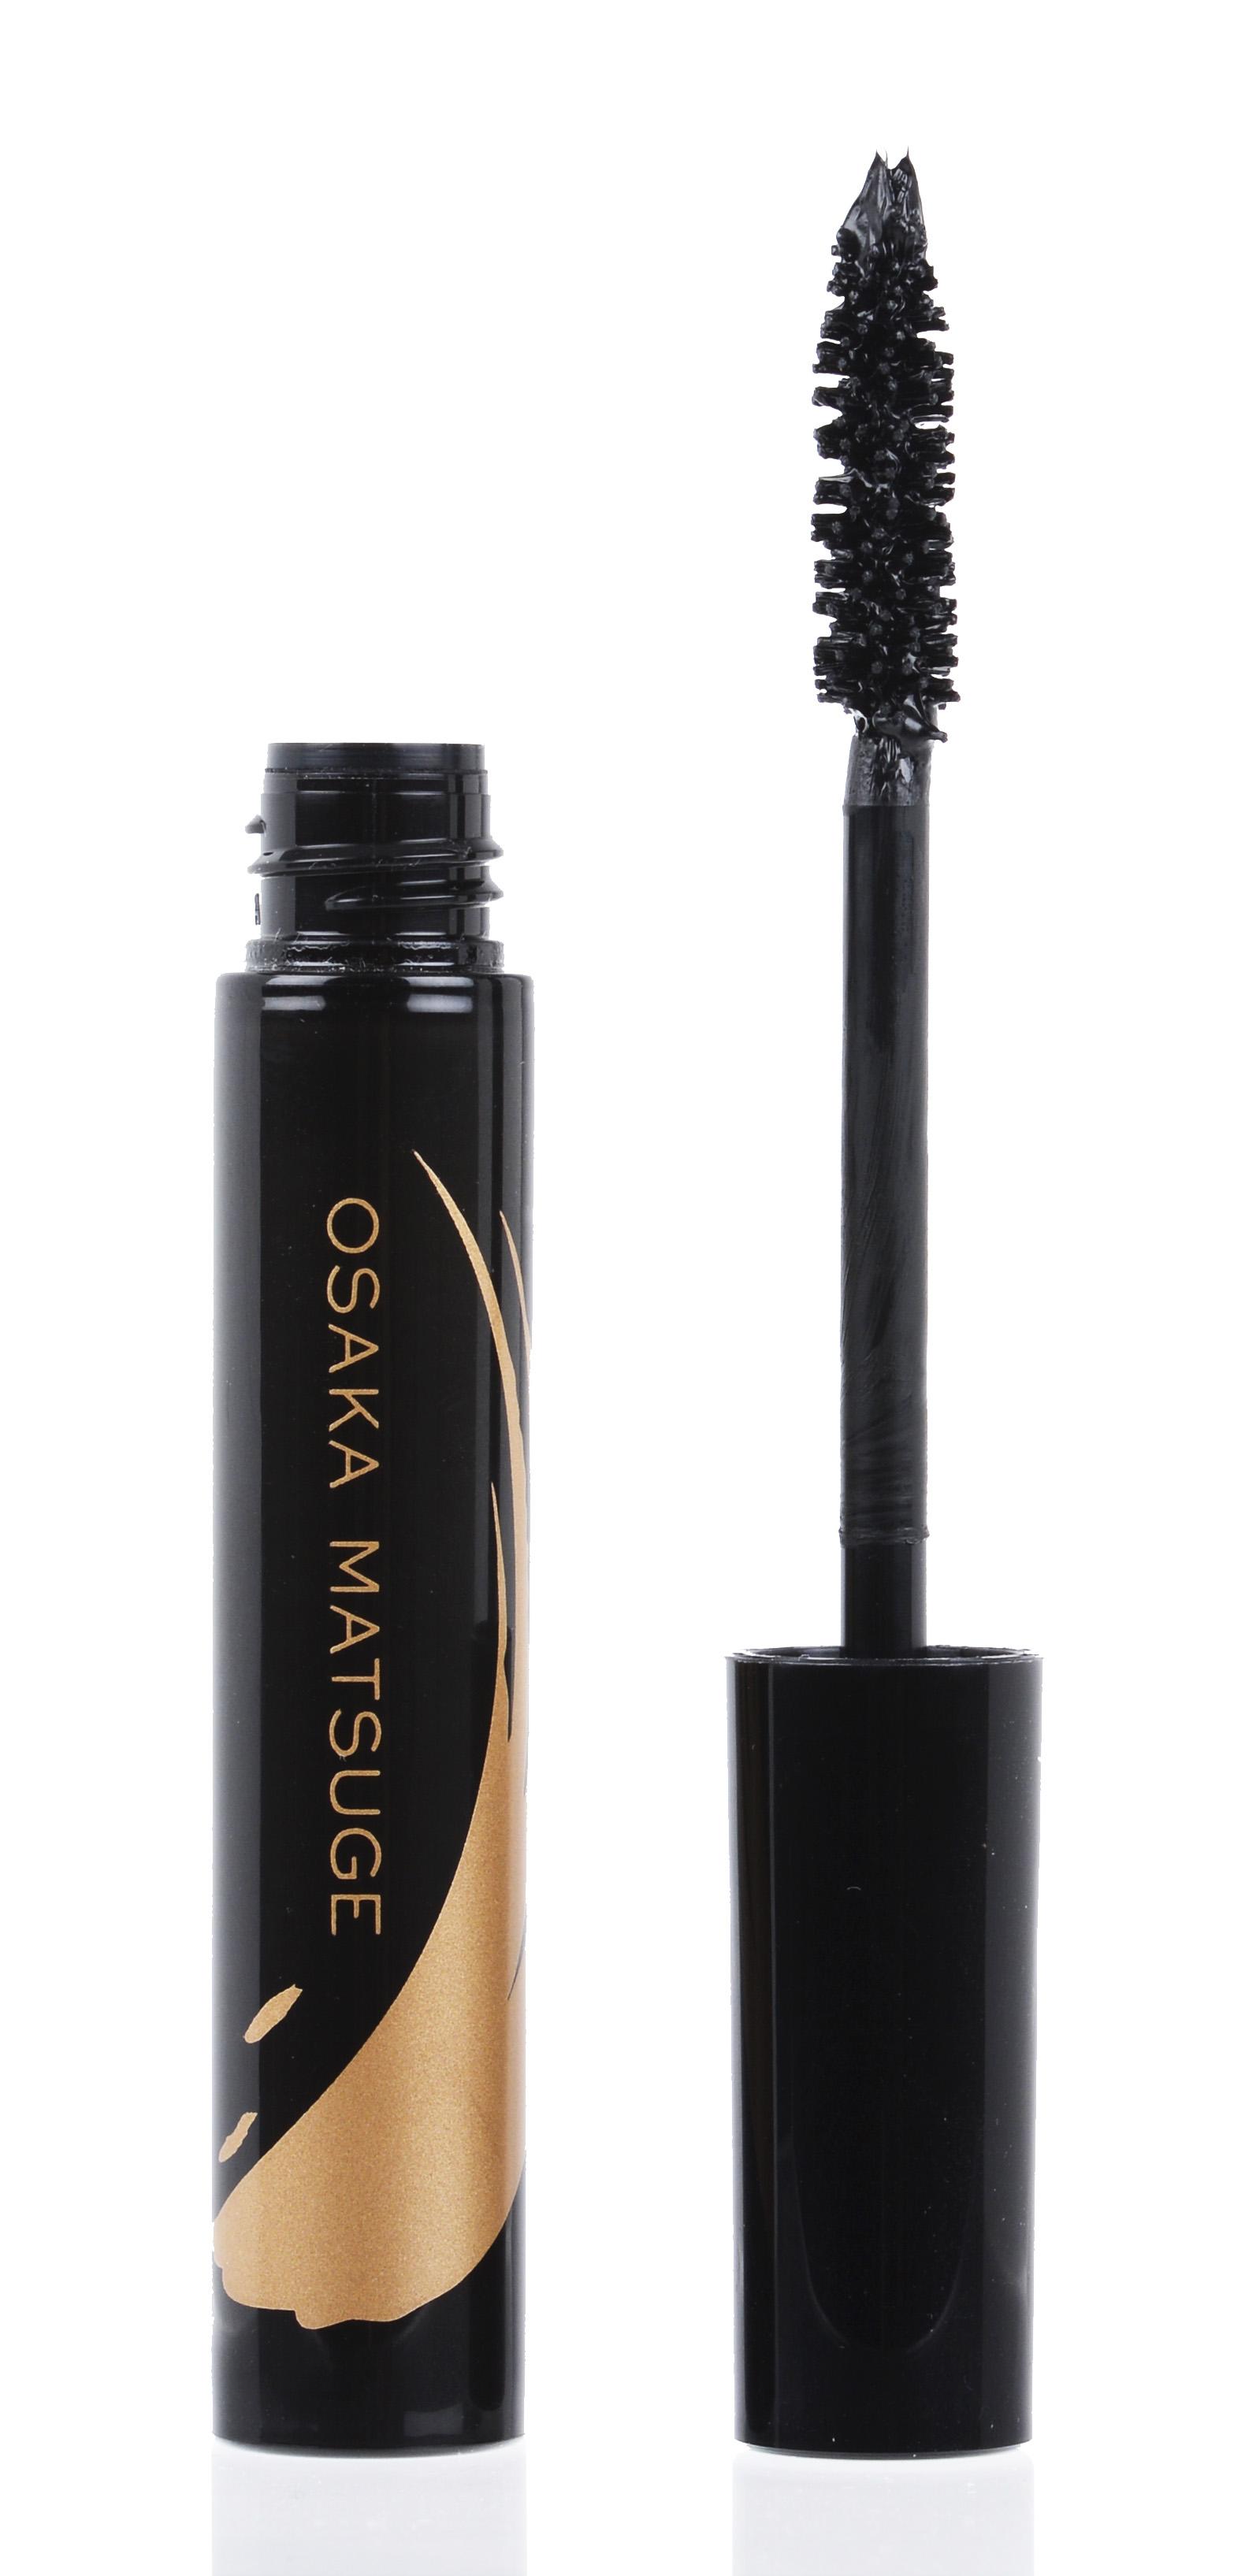 Osaka Matsuge Fiber Mascara True Black